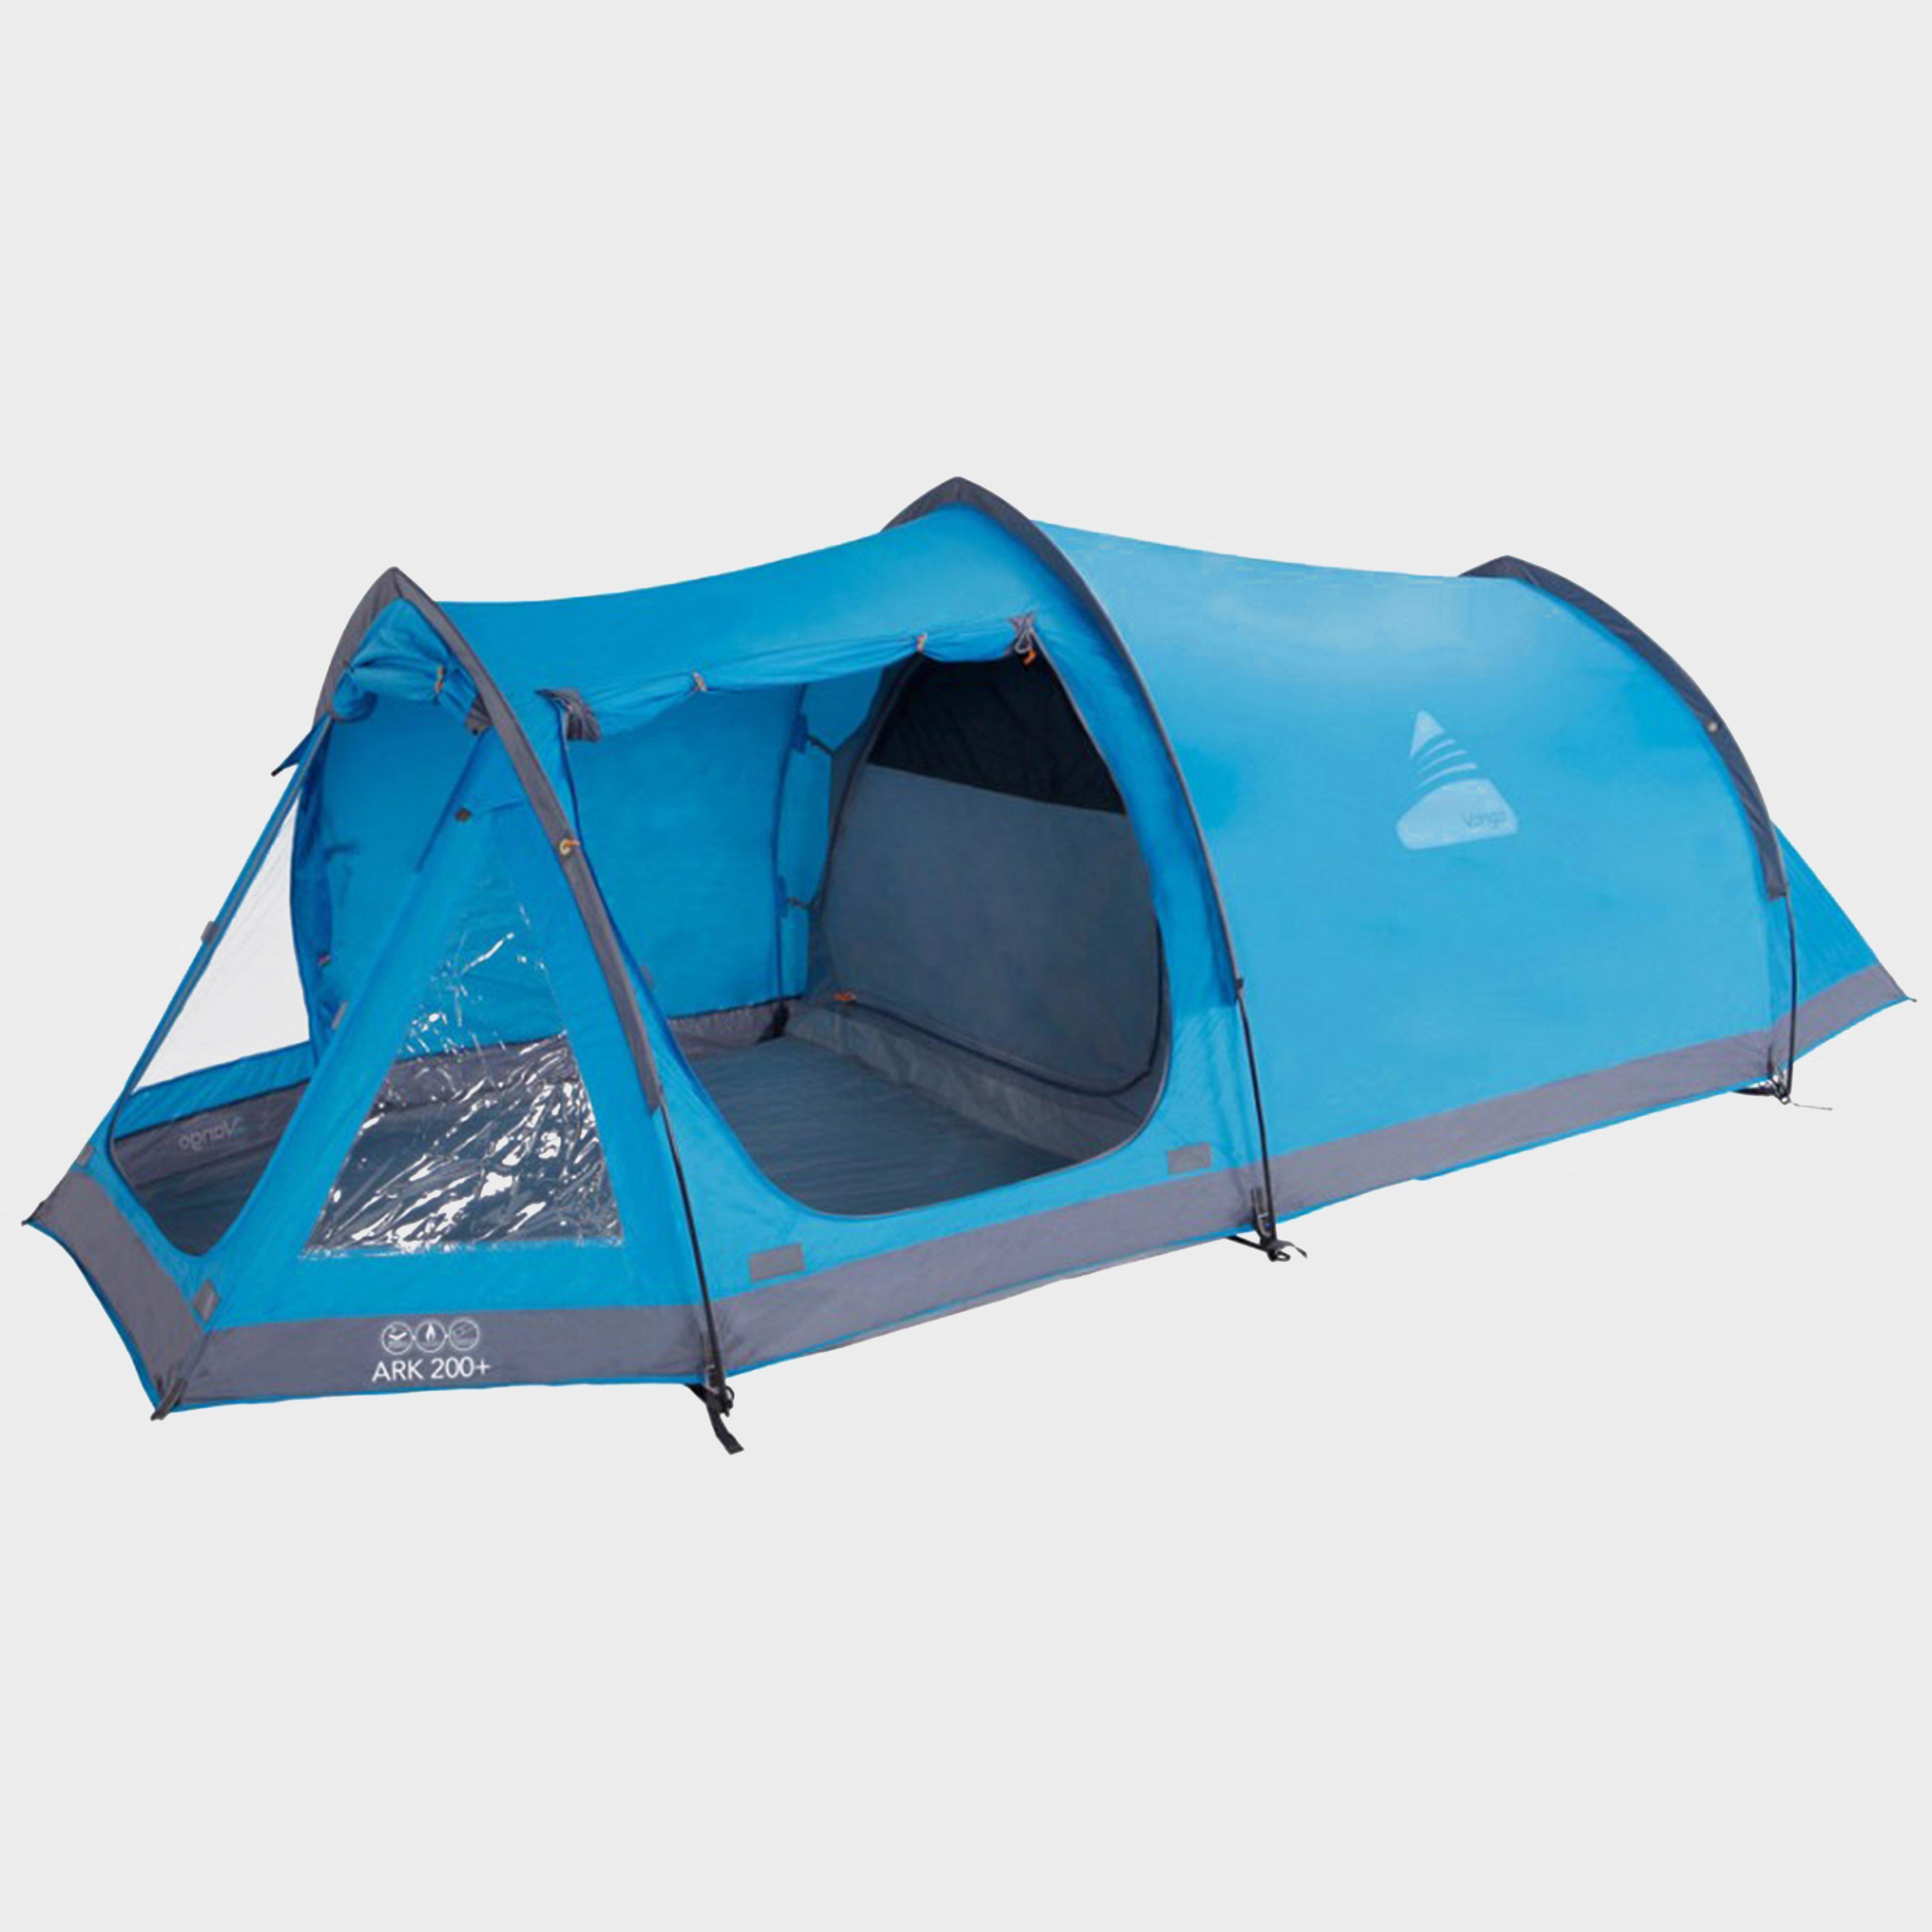 VANGO Ark 200 Plus 2 Person Tent & 2 Person Tents | Blacks